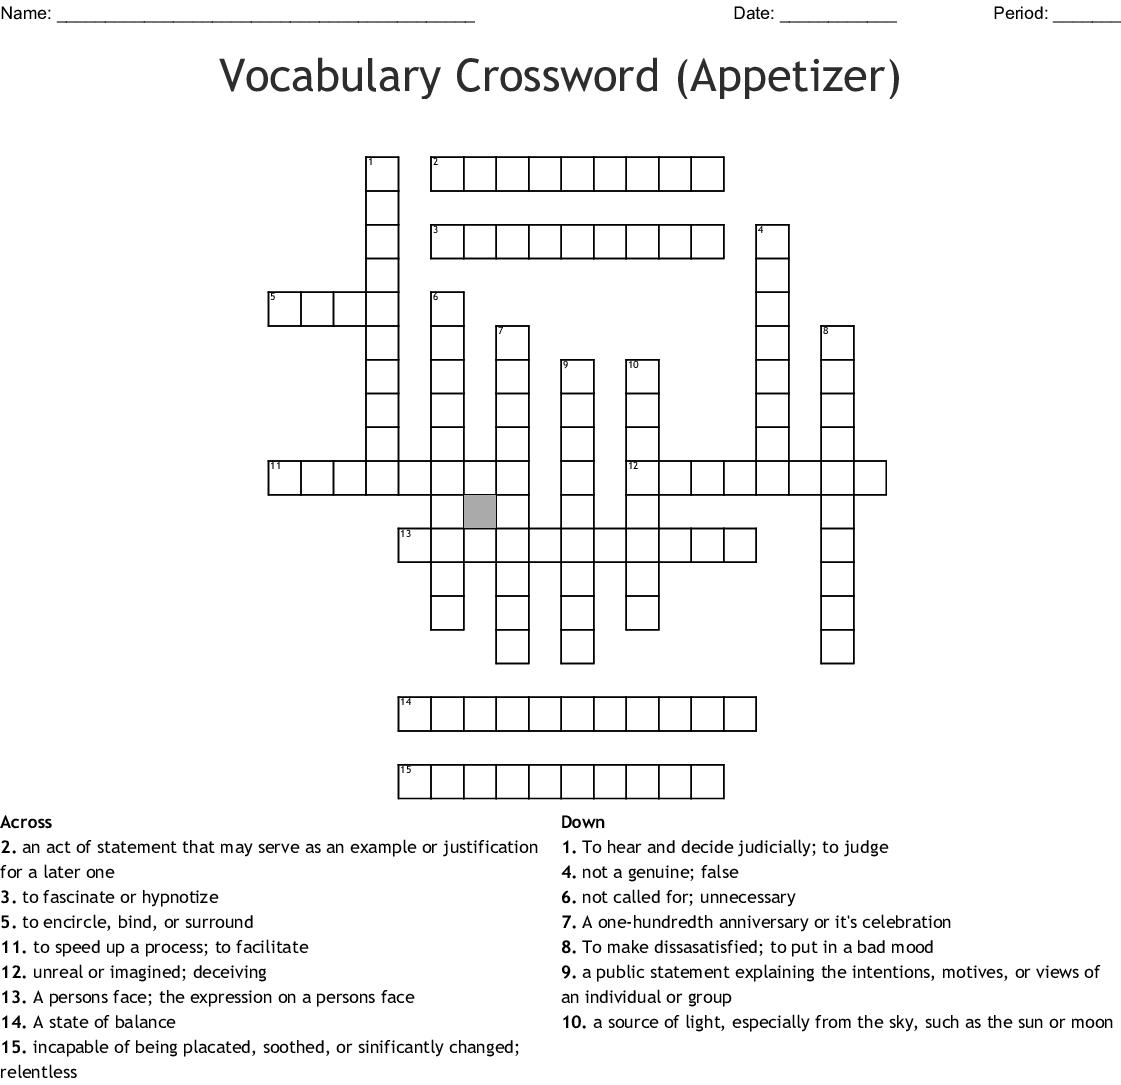 Similar to Crossword Puzzle (Appetizer) - WordMint